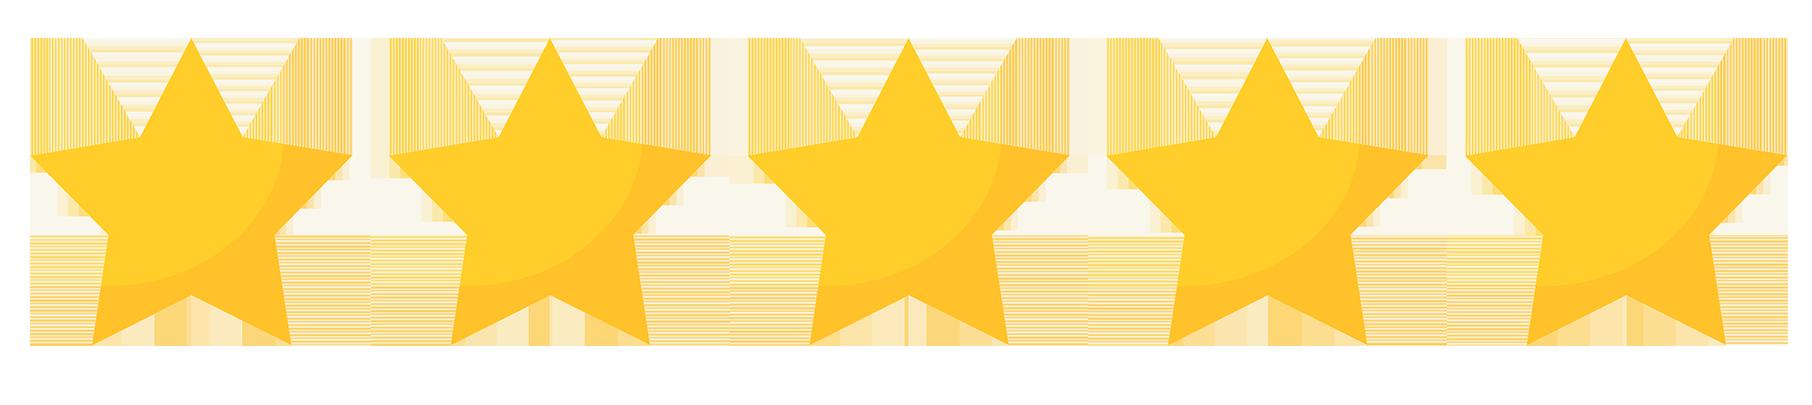 2020.07.02-5-Stars